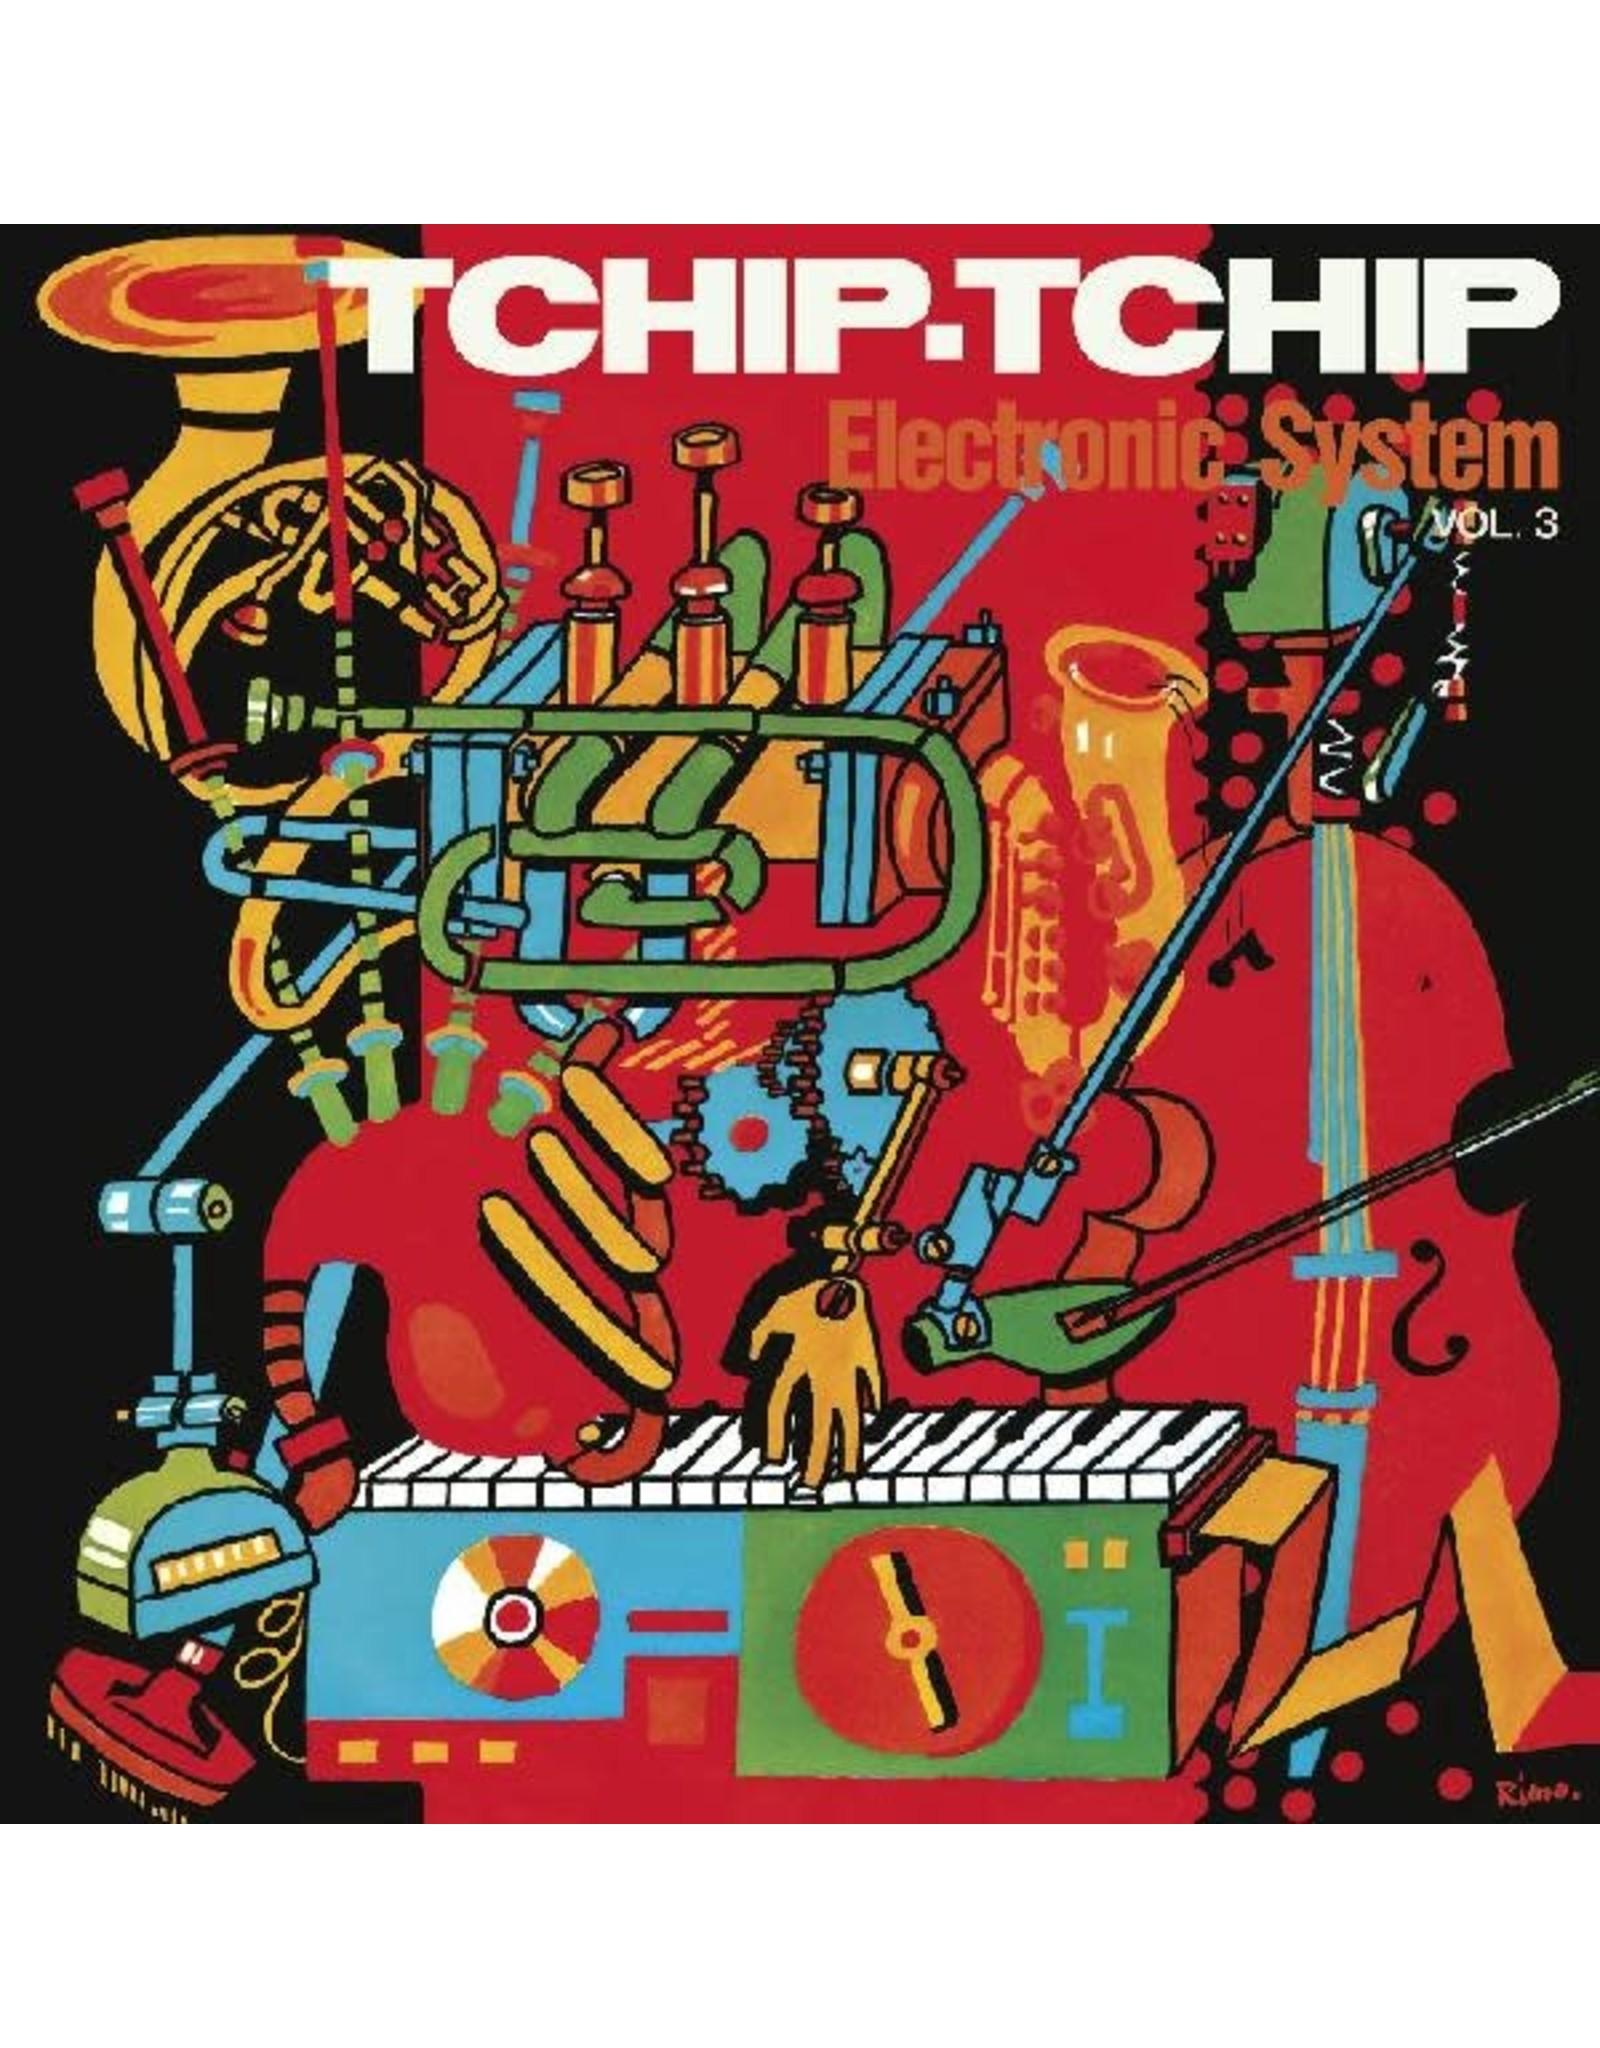 New Vinyl The Electronic System - Tchip Tchip // Vol. 3 (Colored) LP